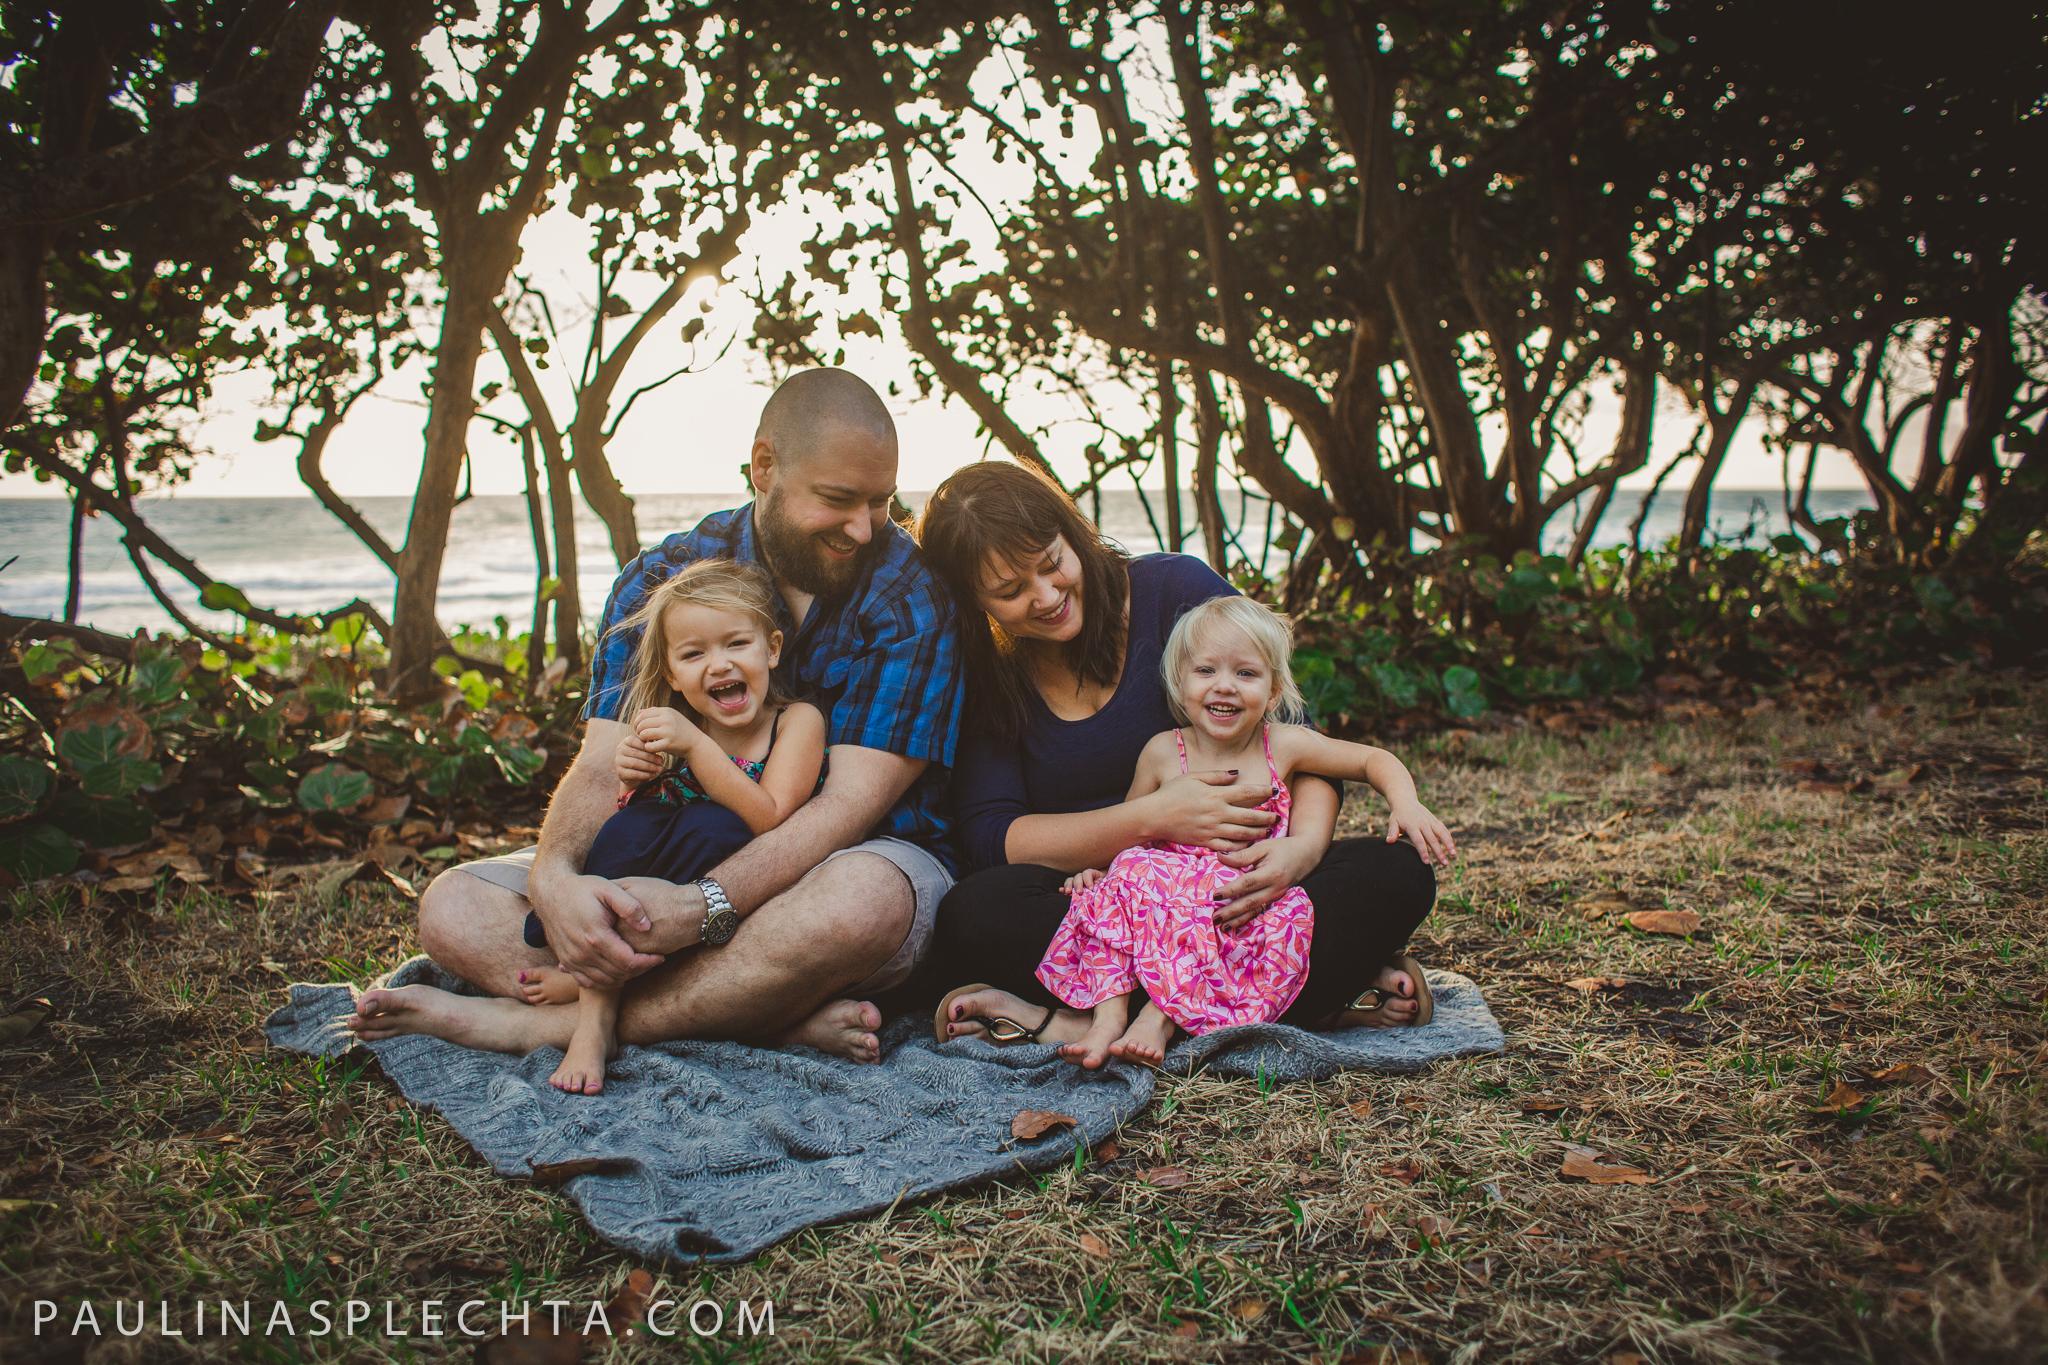 Family Photographer South Florida Pompano Broward Palm Beach Babies Baby Newborn Breastfeeding Birth Photograpy Beach Home Documentary Session-85.jpg